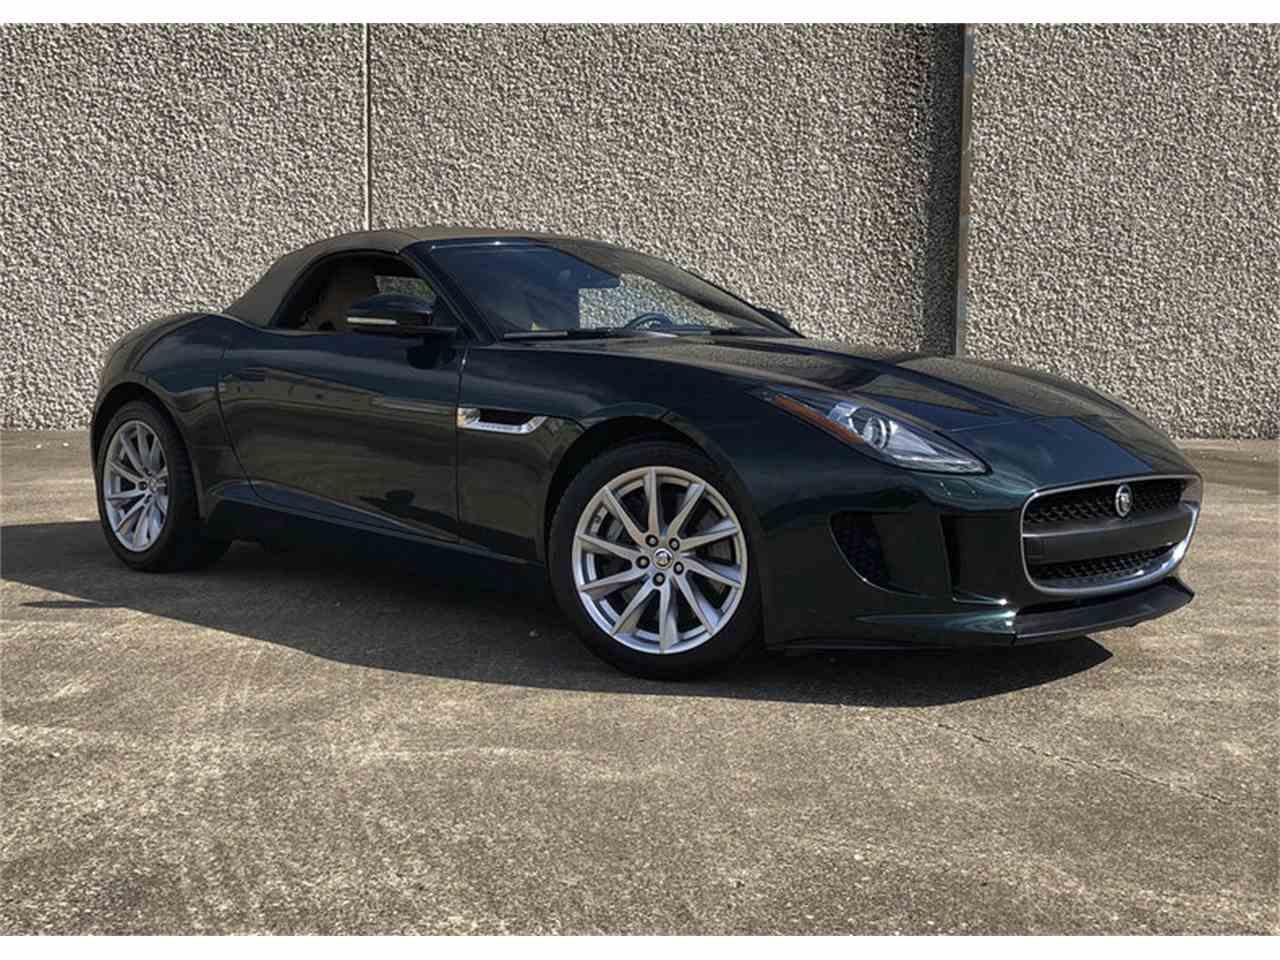 miami north jaguar sale cars salvage f for lot fl type